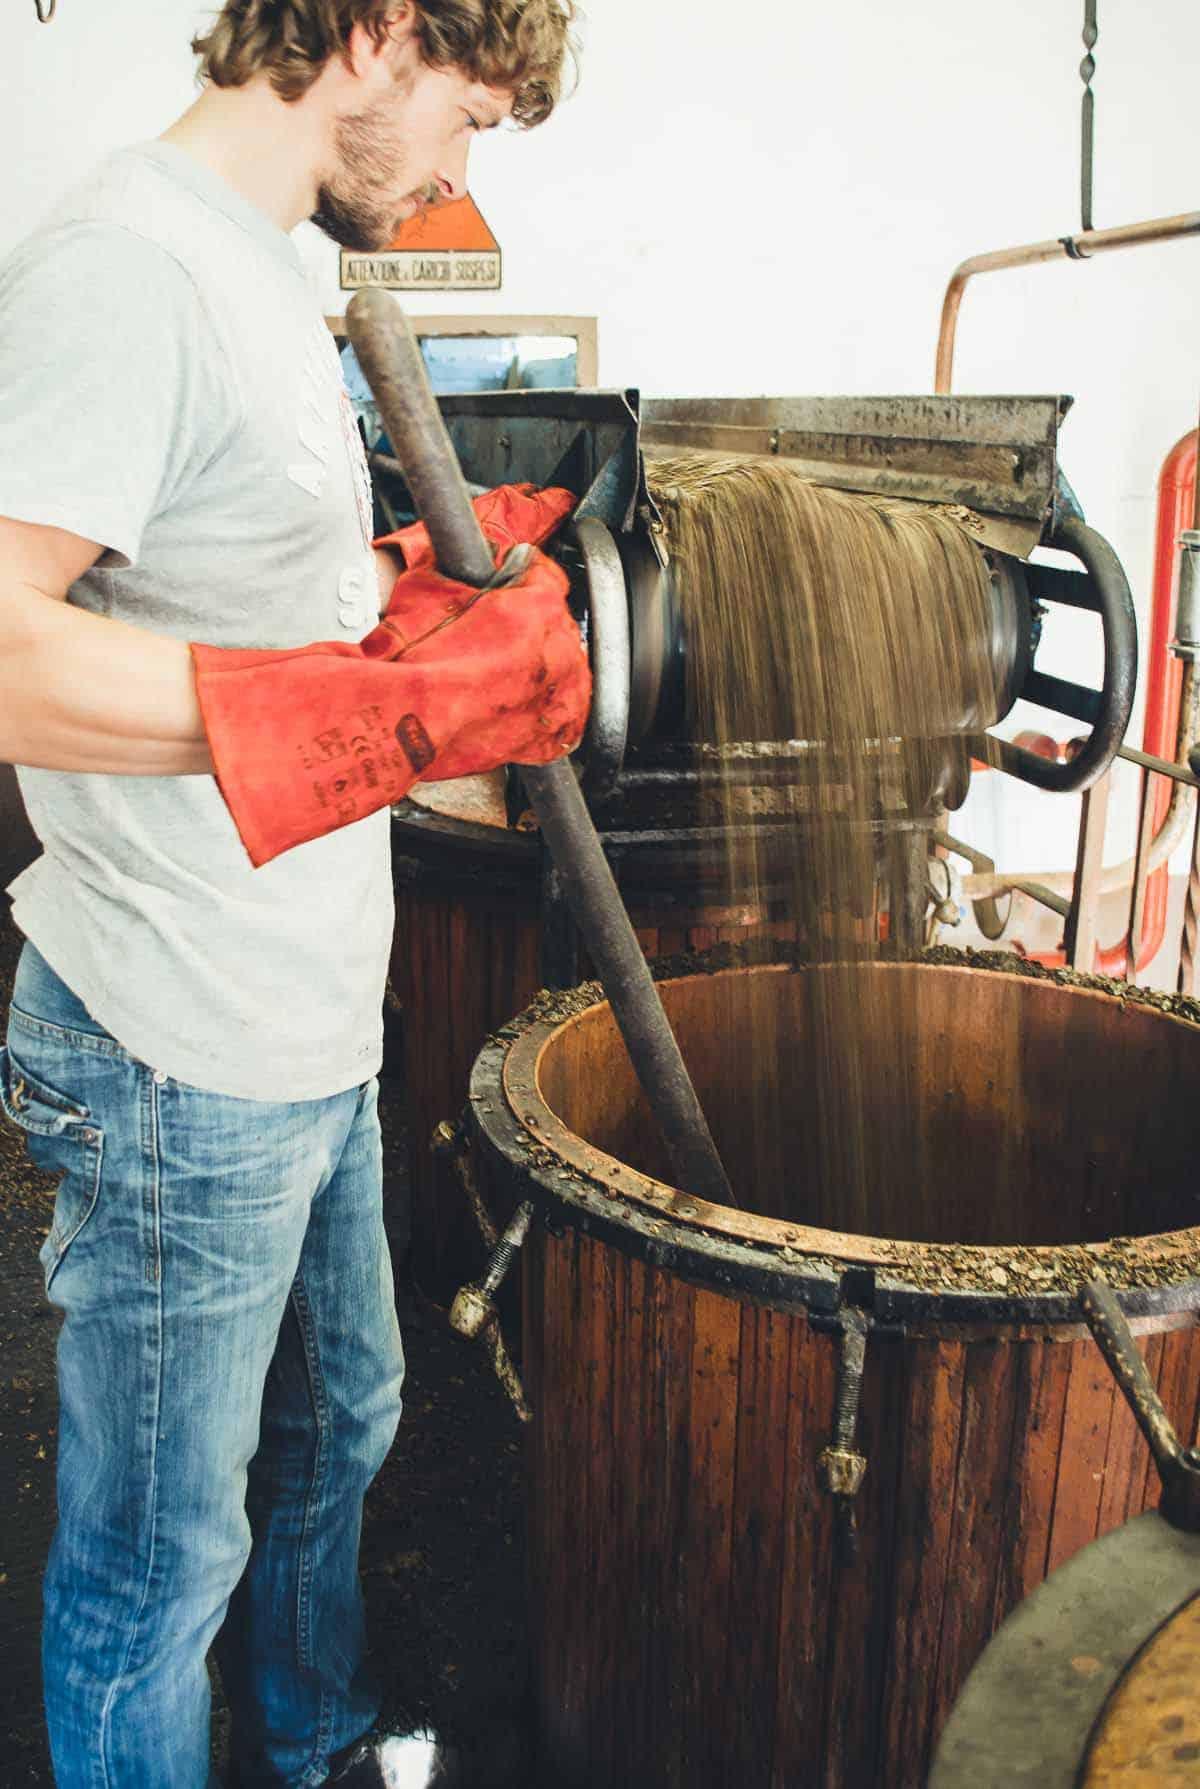 Behind The Scenes Of A Grappa Distillery Very Eatalian